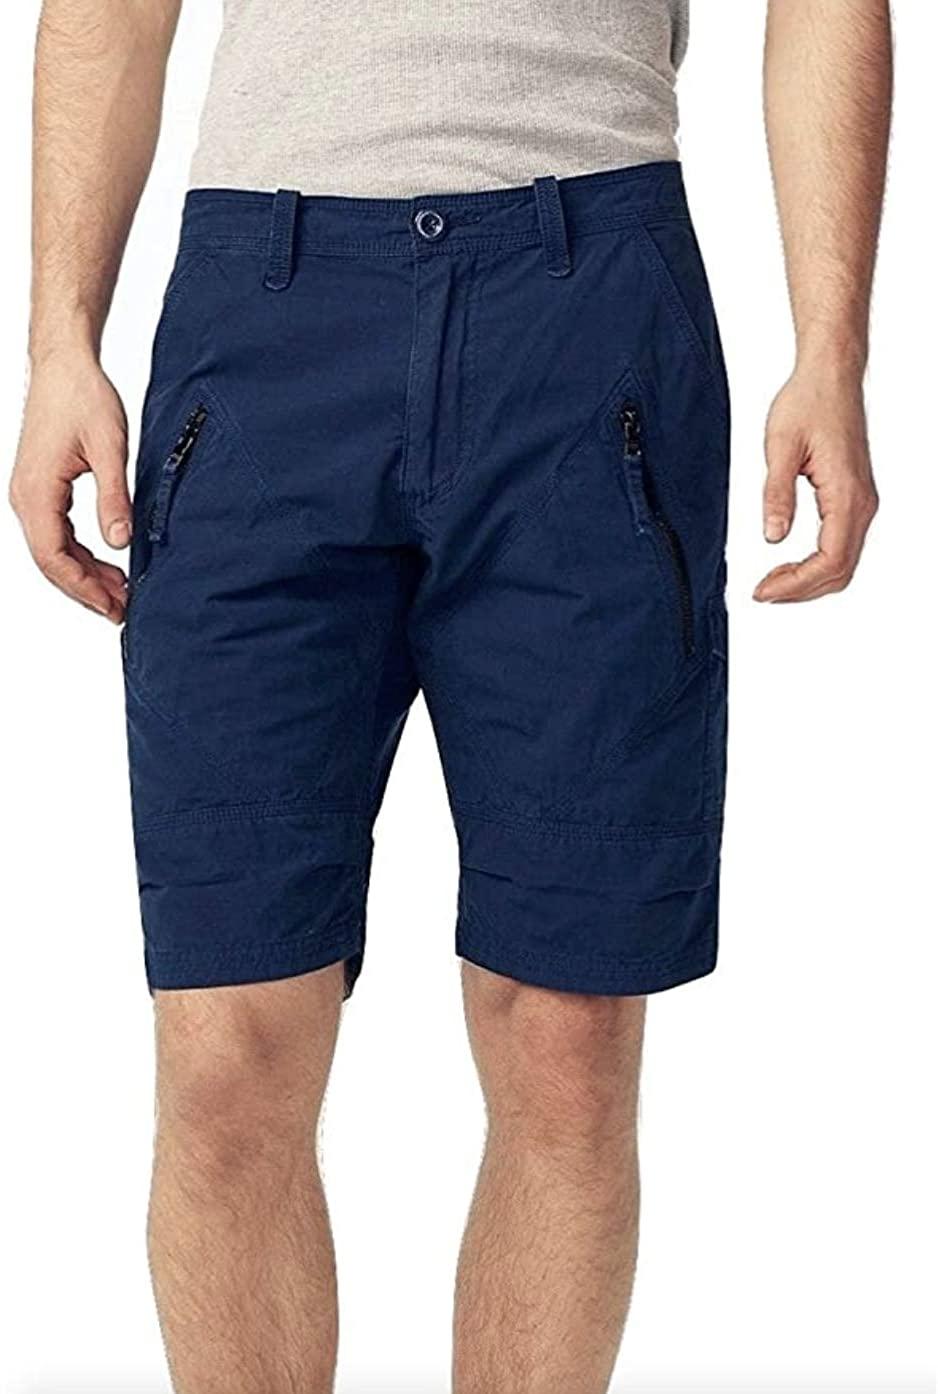 Armani Exchange AIX Utility Zip Short, Navy, Size 30